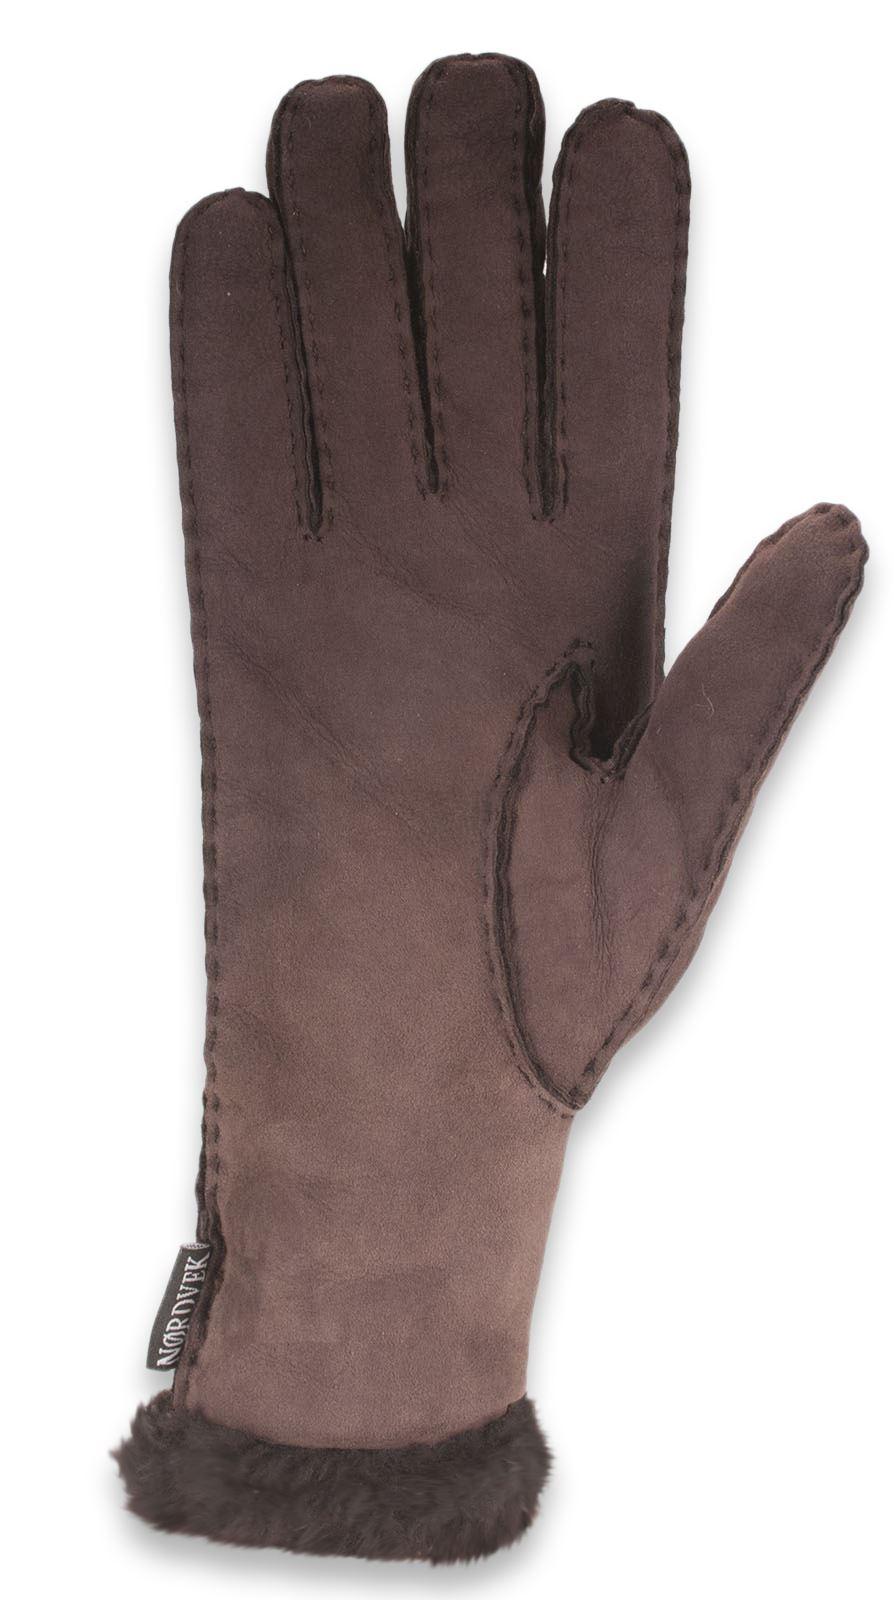 nordvek damen lange echte lammfell handschuhe mit spitzen. Black Bedroom Furniture Sets. Home Design Ideas